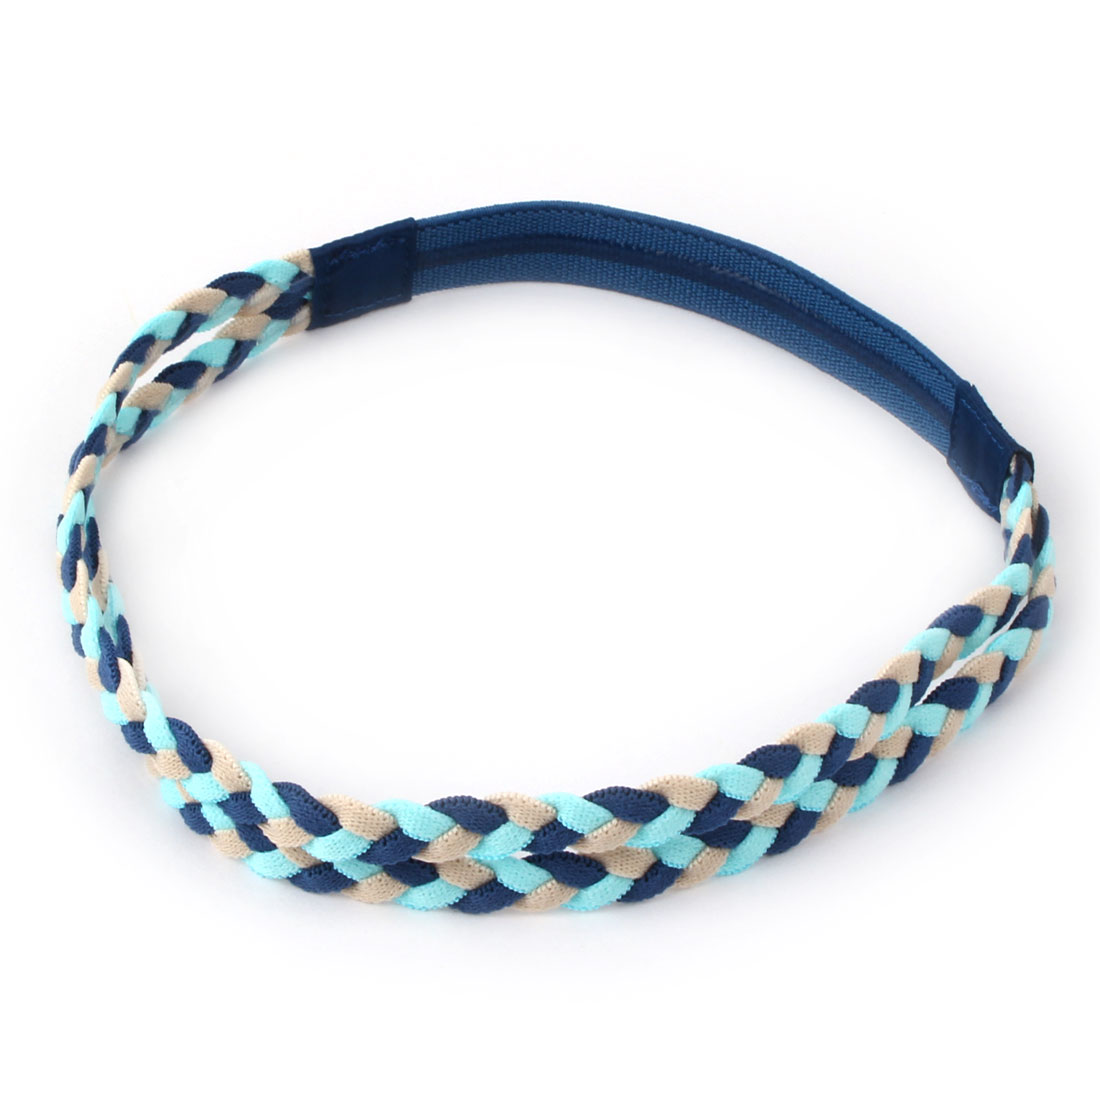 Exercise Elastic Fabric Double Braid Design Non-slip Sports Headband Headwrap Blue Beige